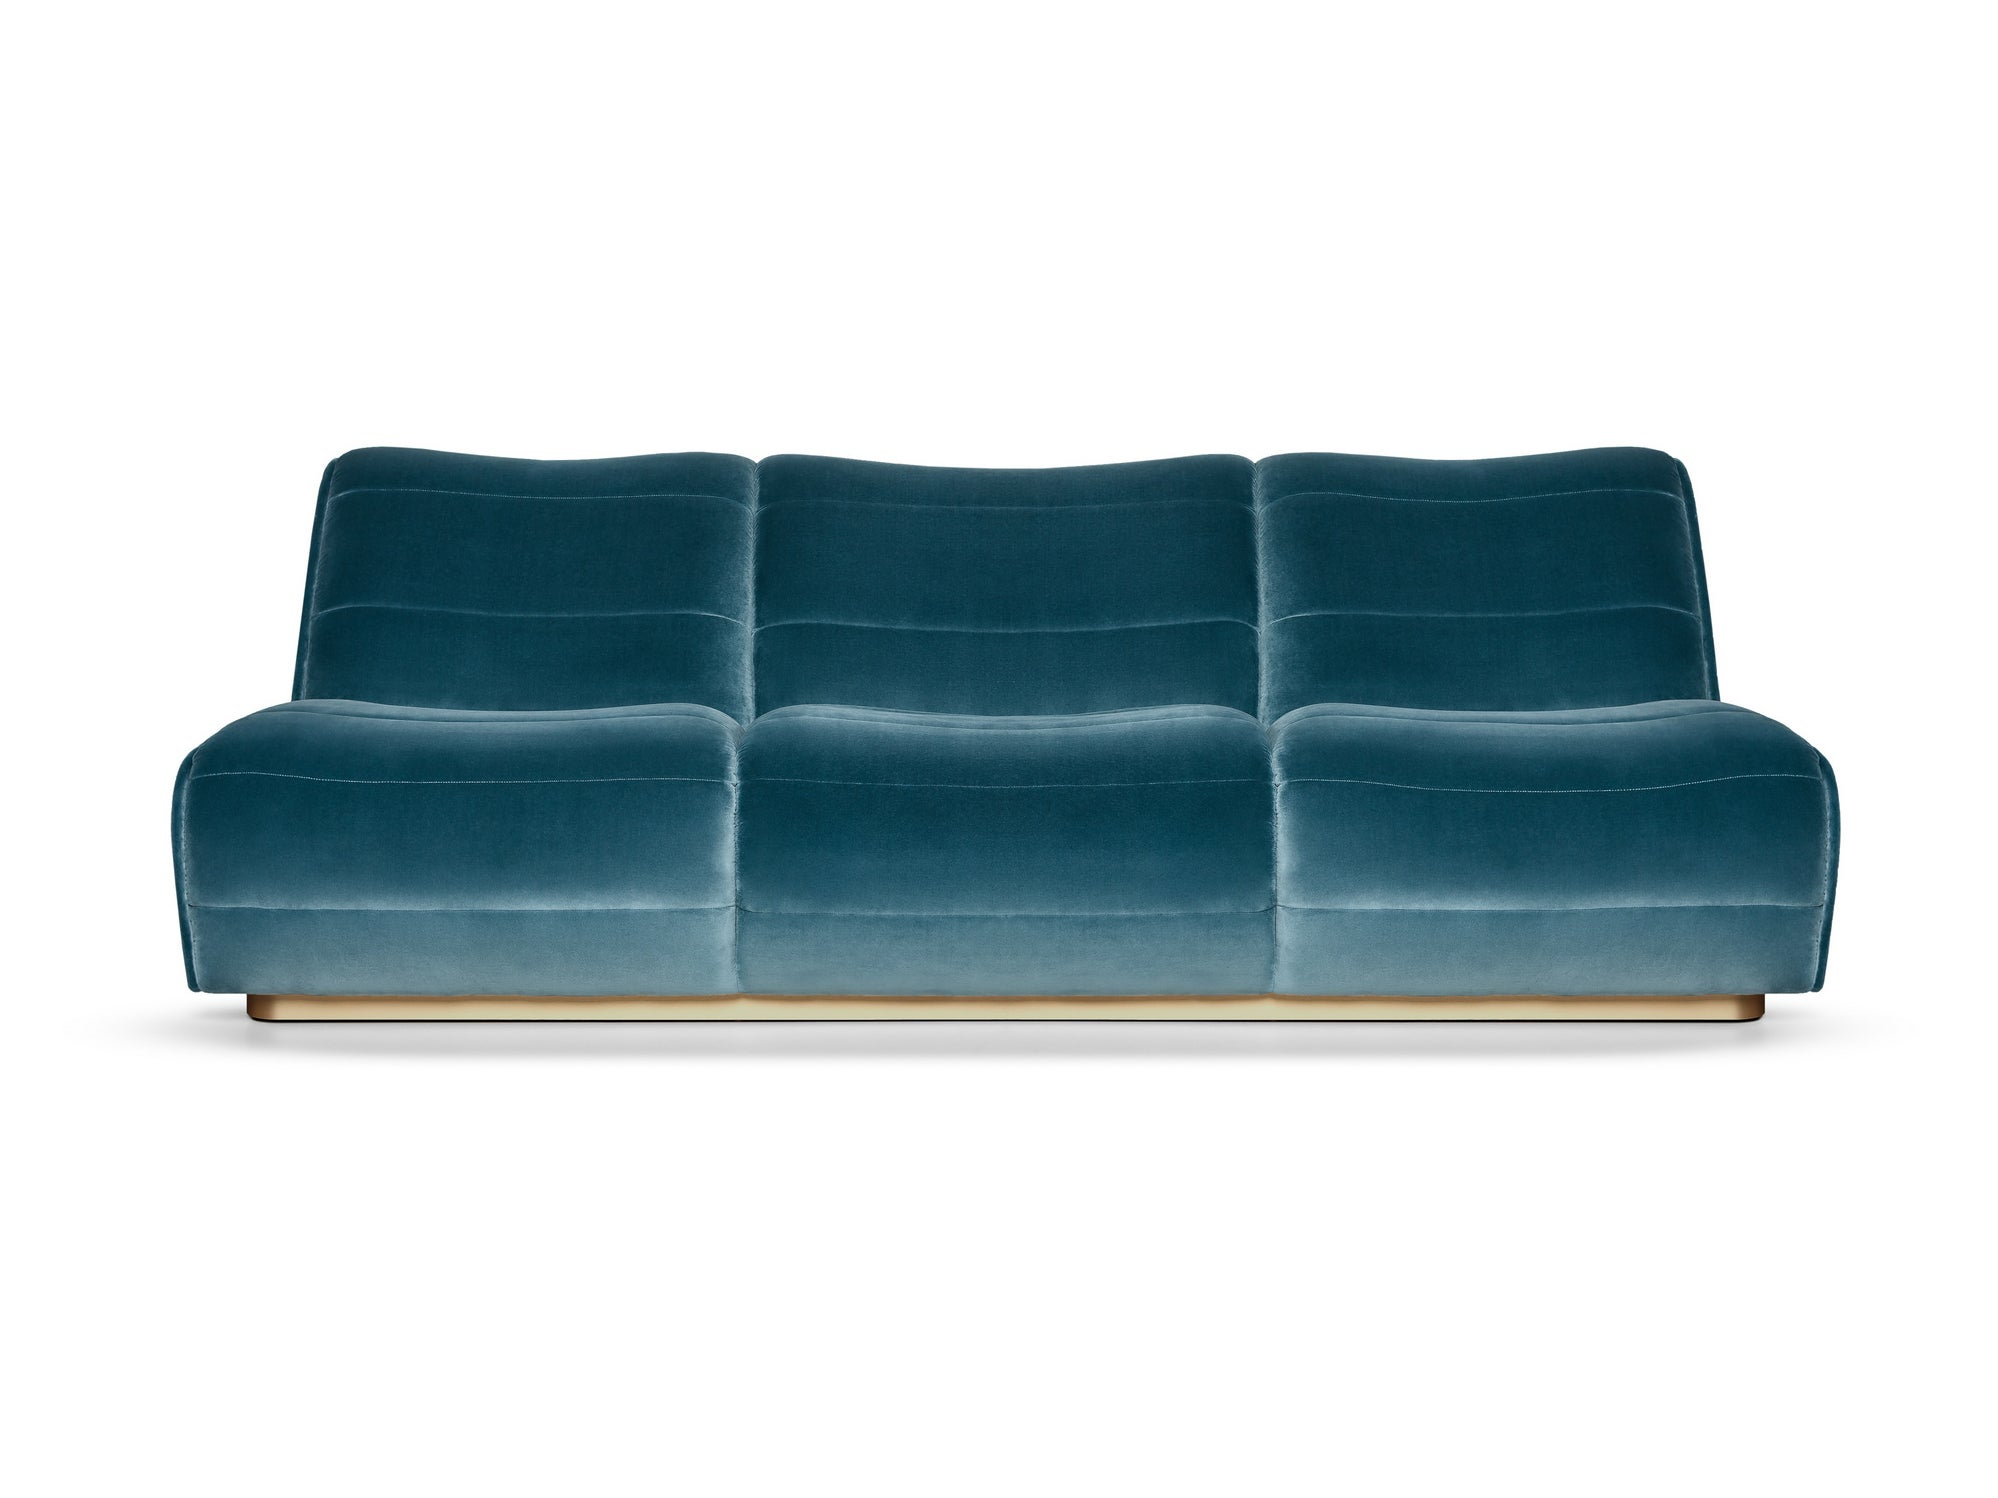 NEWMAN _ 3 seater sofa